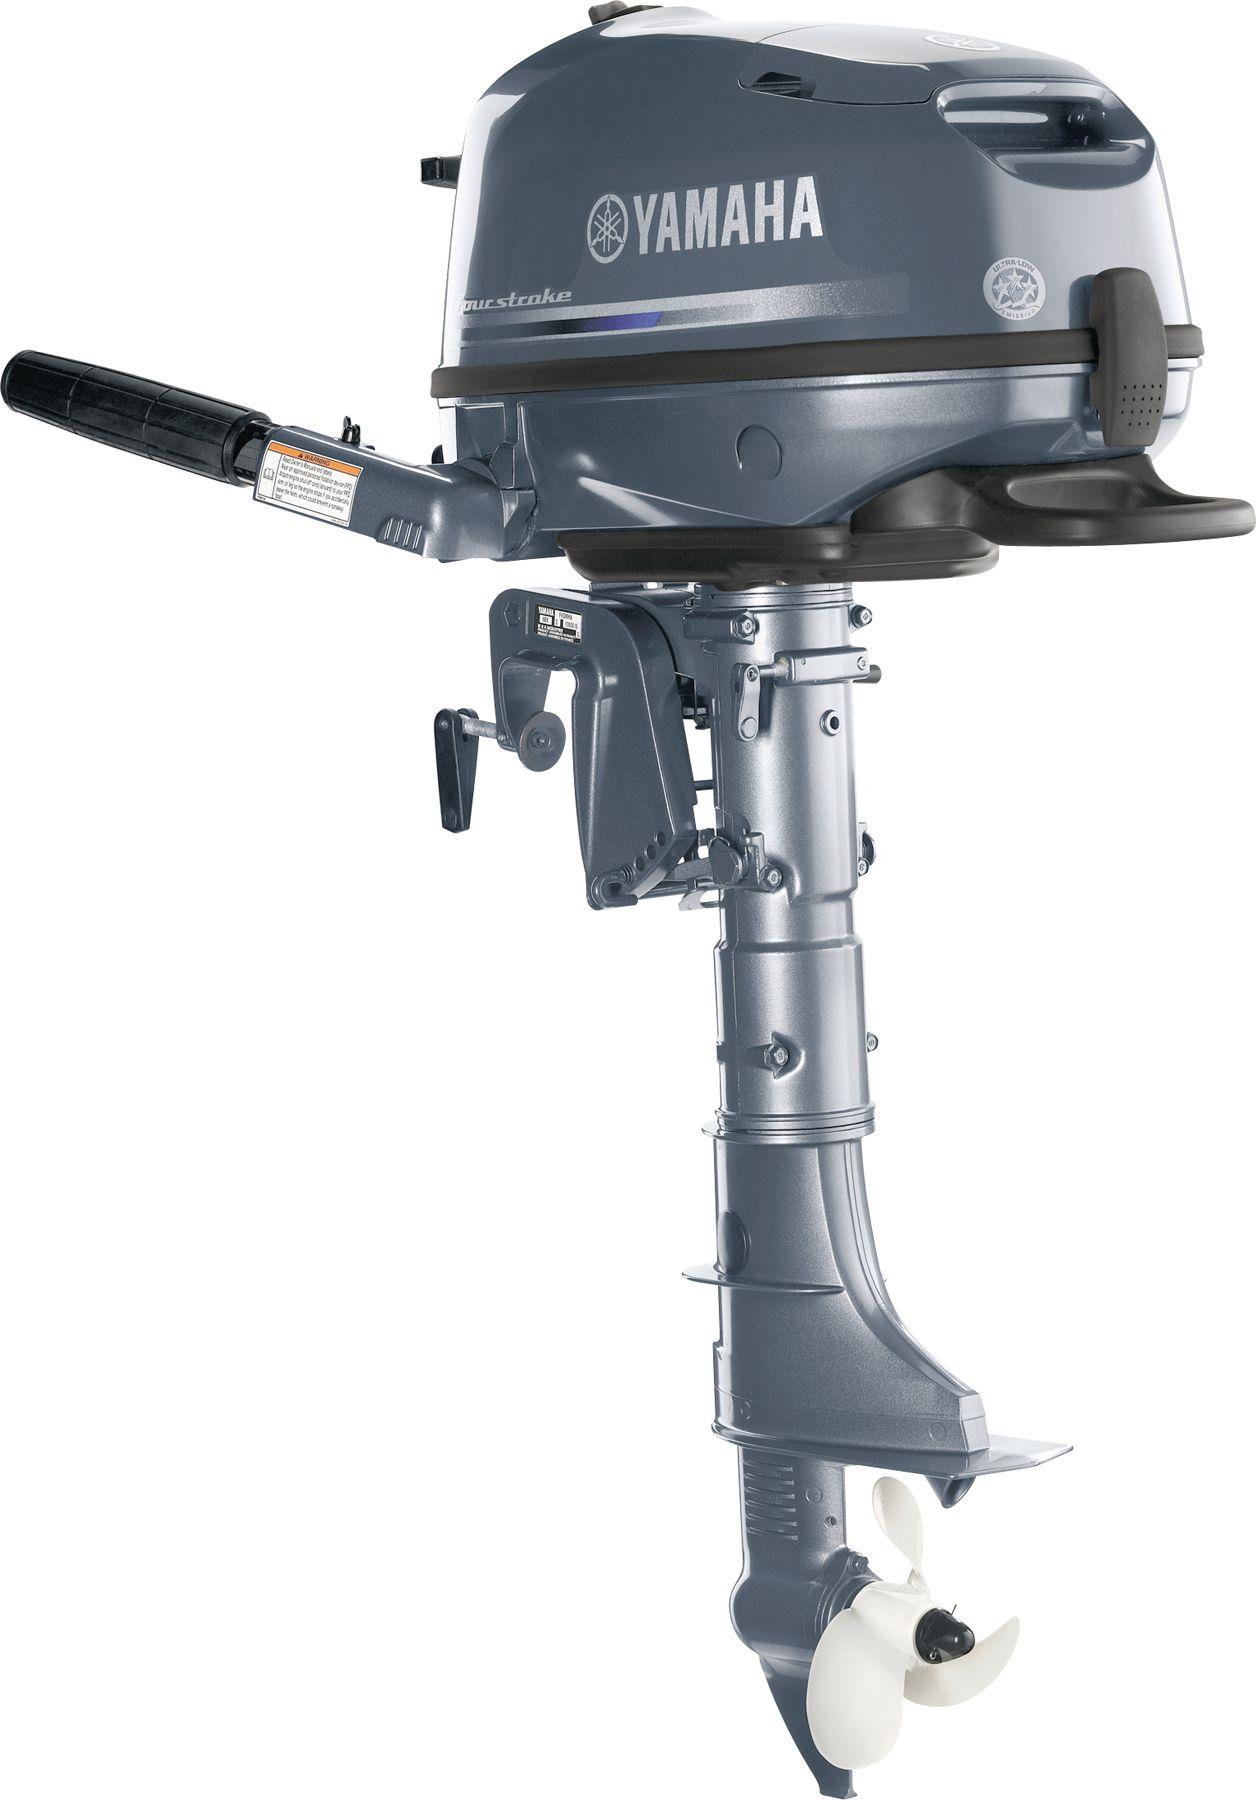 New demo 2012 yamaha f4smha 4hp 4 stroke tiller outboard for 2012 yamaha outboard motors